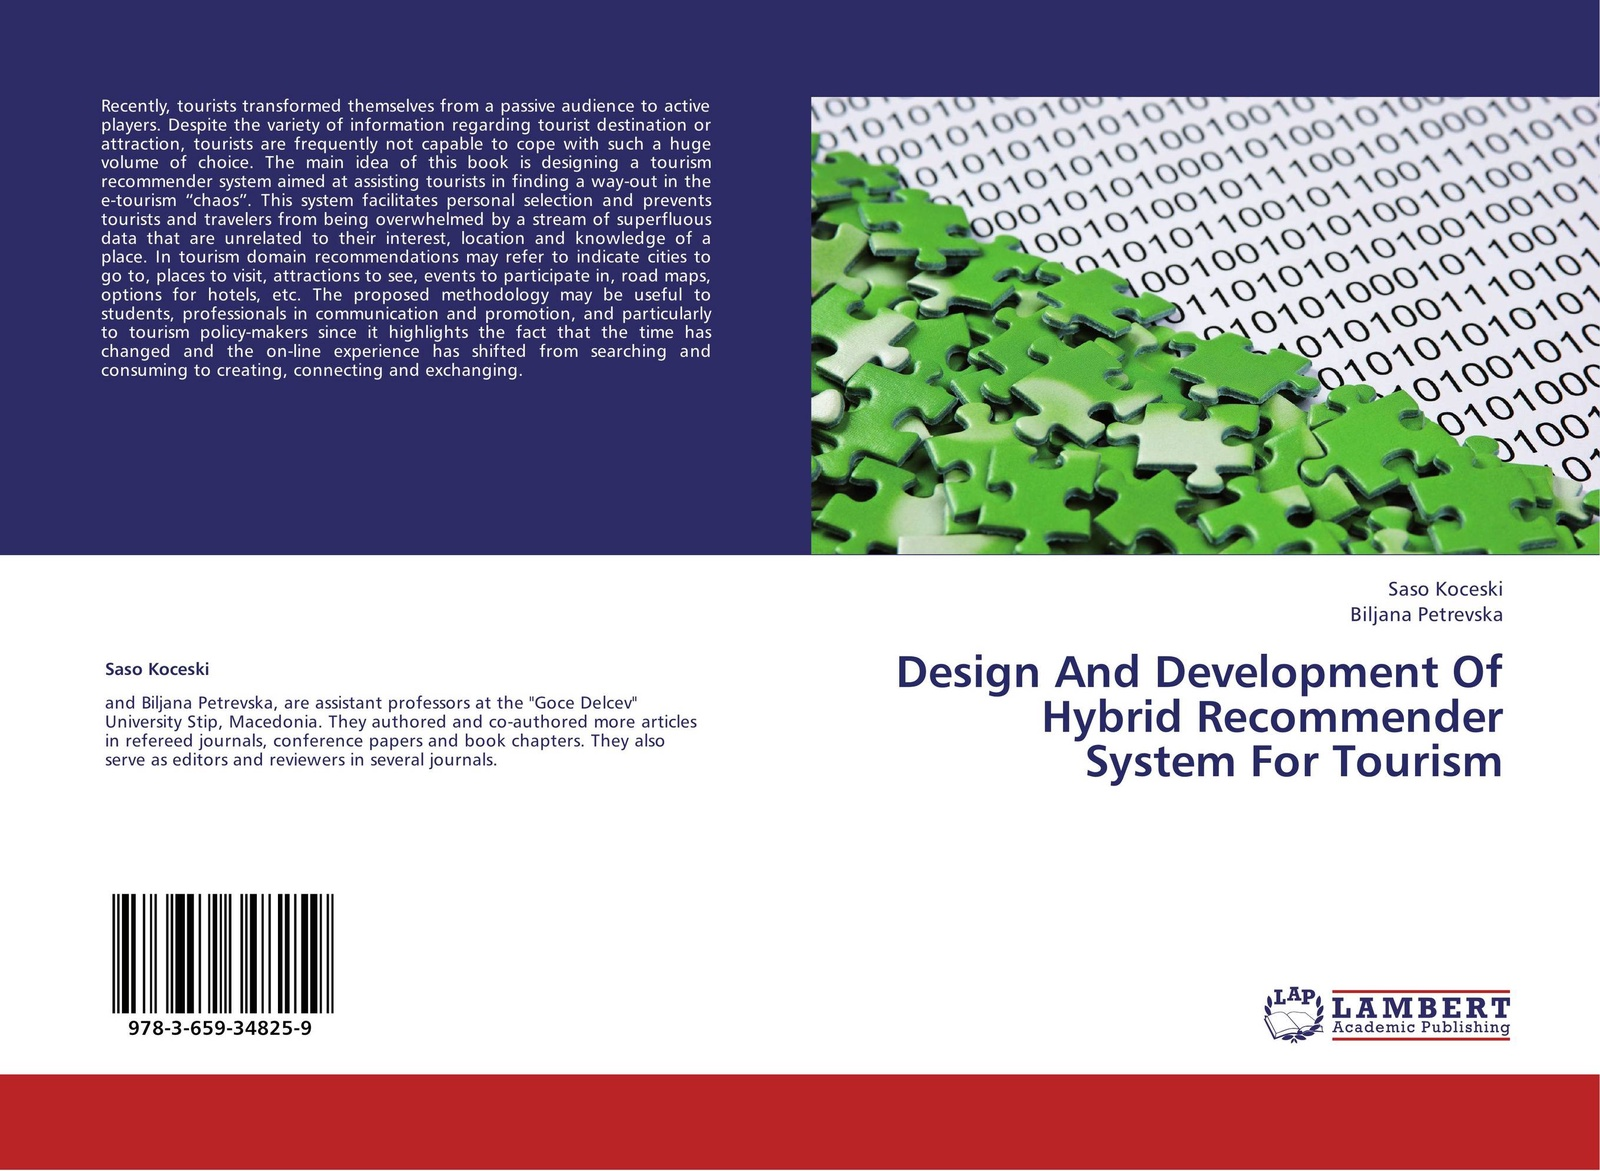 купить Saso Koceski and Biljana Petrevska Design And Development Of Hybrid Recommender System For Tourism по цене 3944 рублей